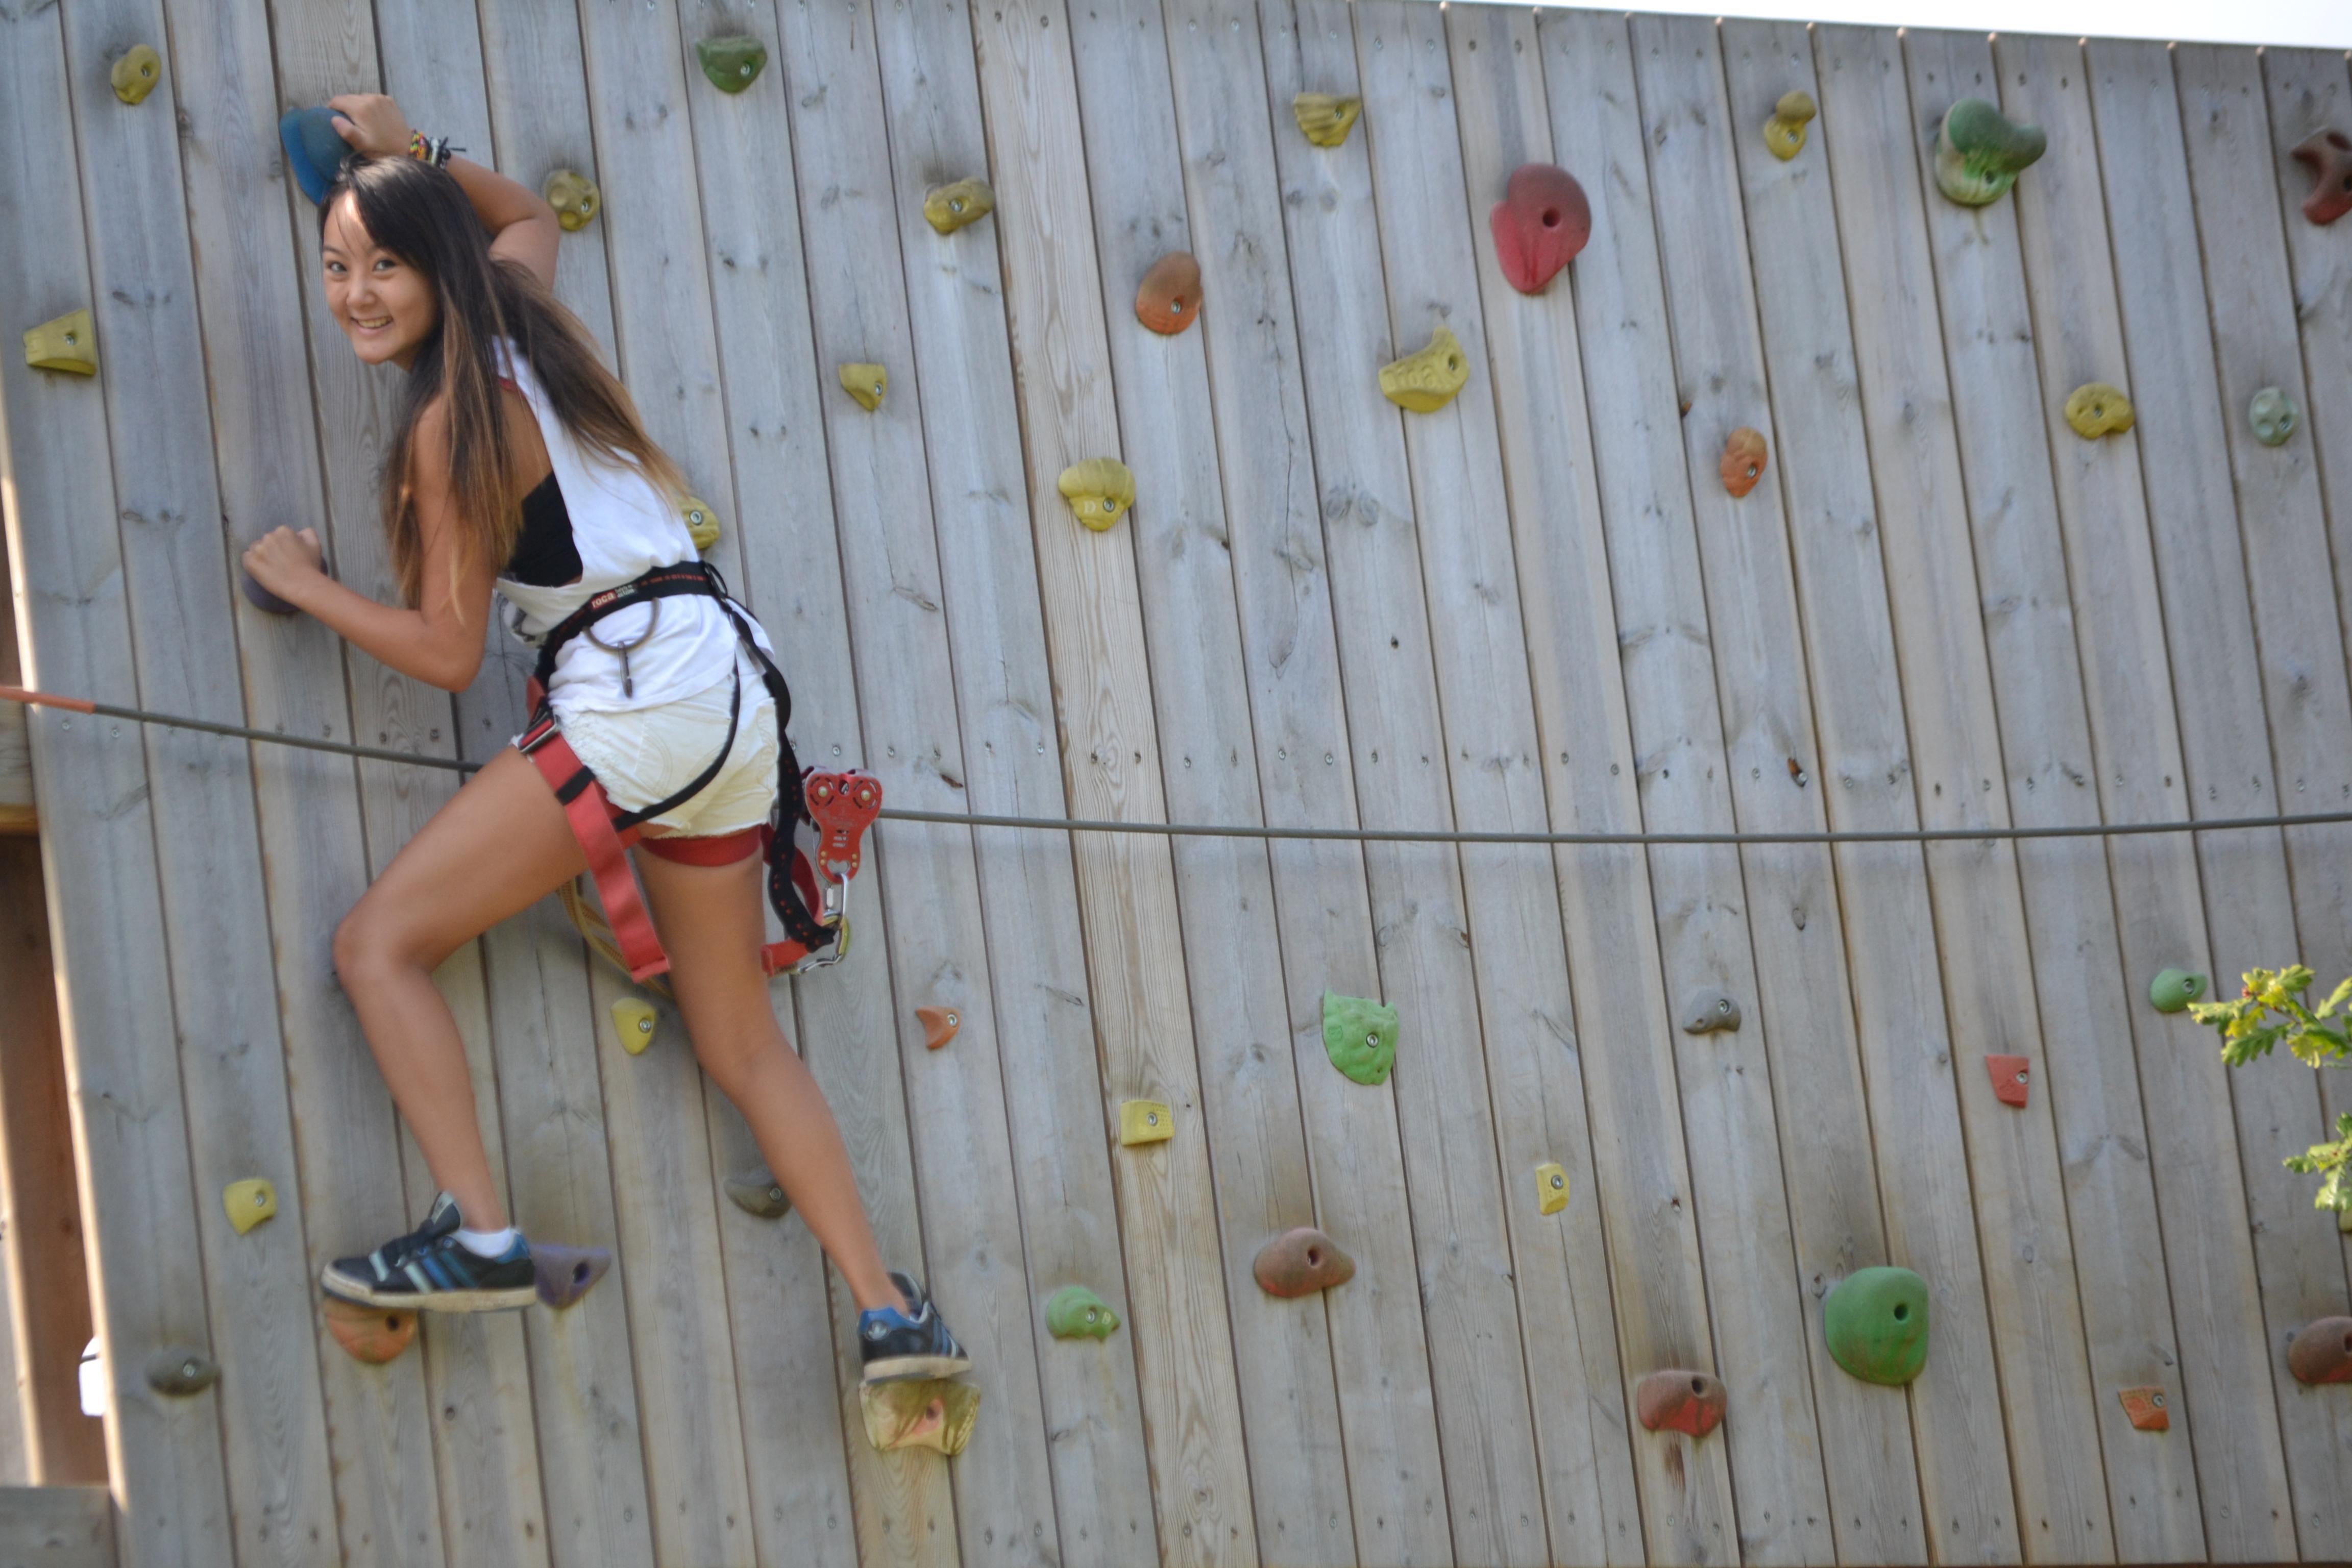 juegos_altura_tirolinas_22_Cantabria_Parque_multiaventura_ocio_juegos_cabuerniaventura